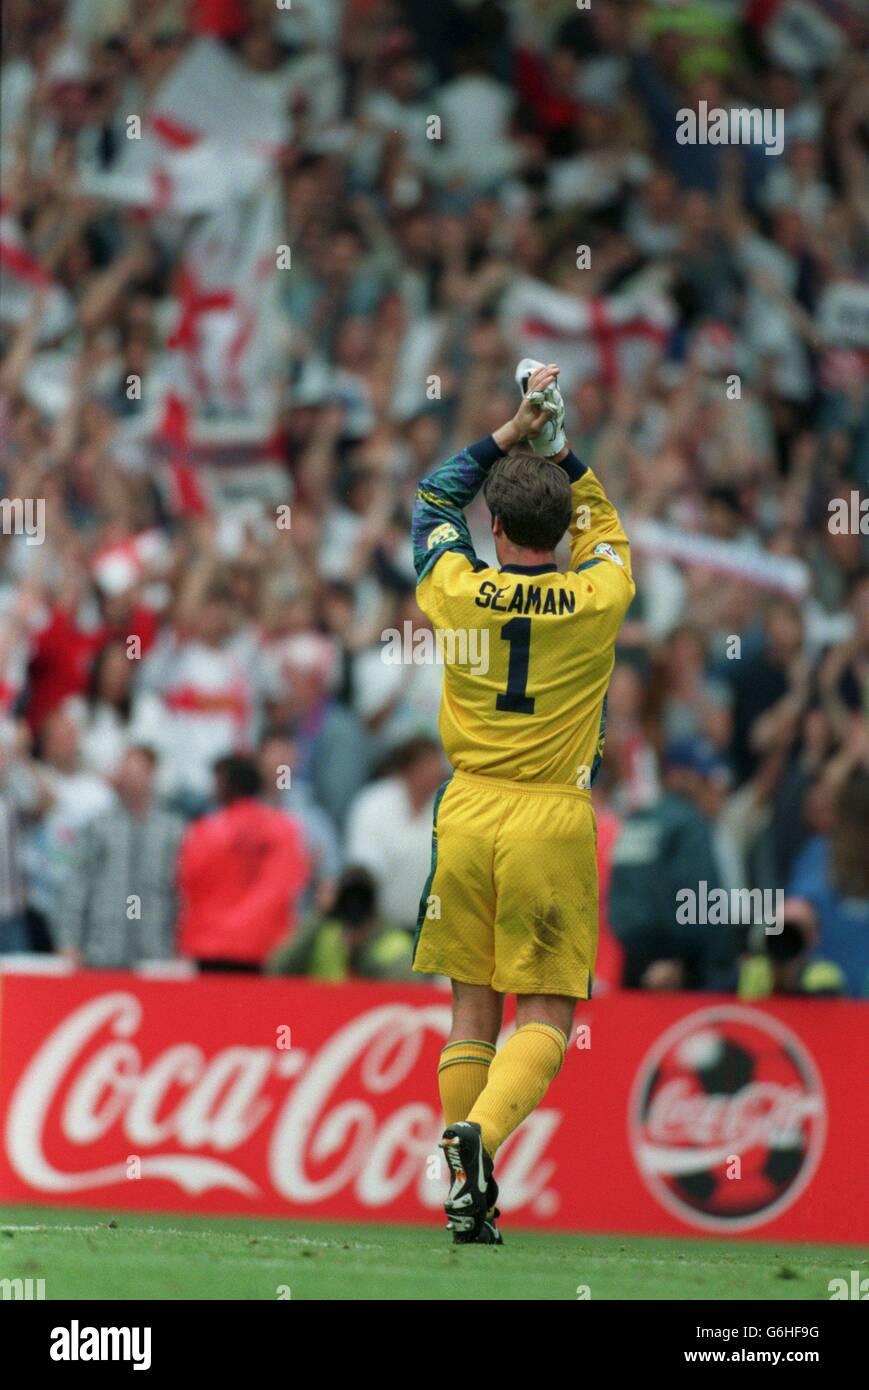 22-JUN-96 ..Inglaterra contra España ... David Seaman, de Inglaterra, saluda a la multitud Foto de stock